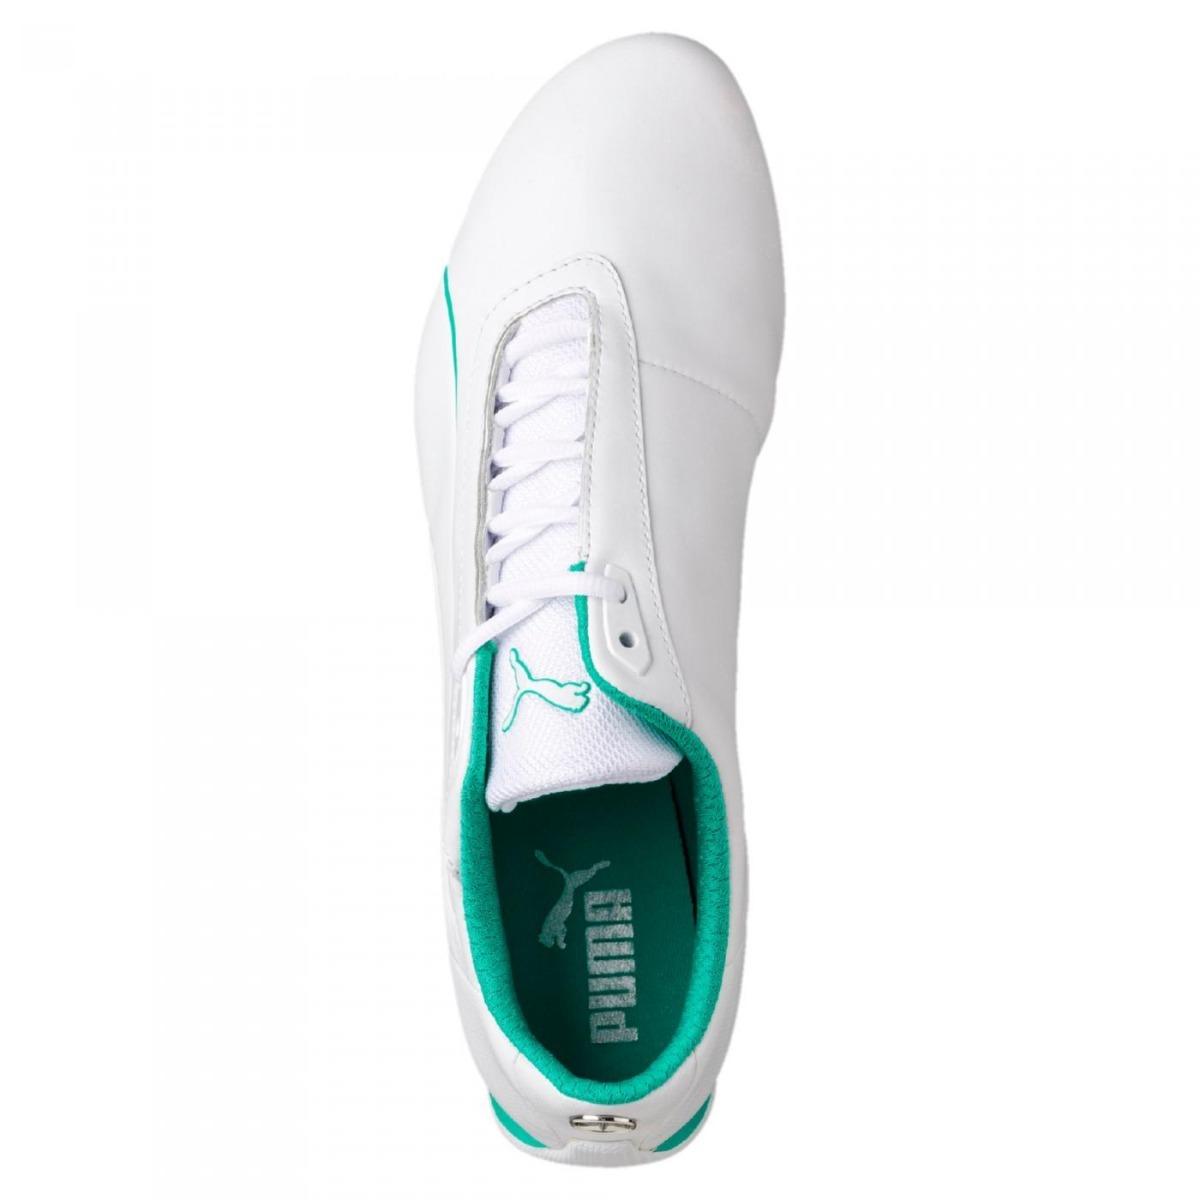 aa3bb4d817 original tenis puma future cat s2 mercedes mamgp blanco zra. Cargando zoom.